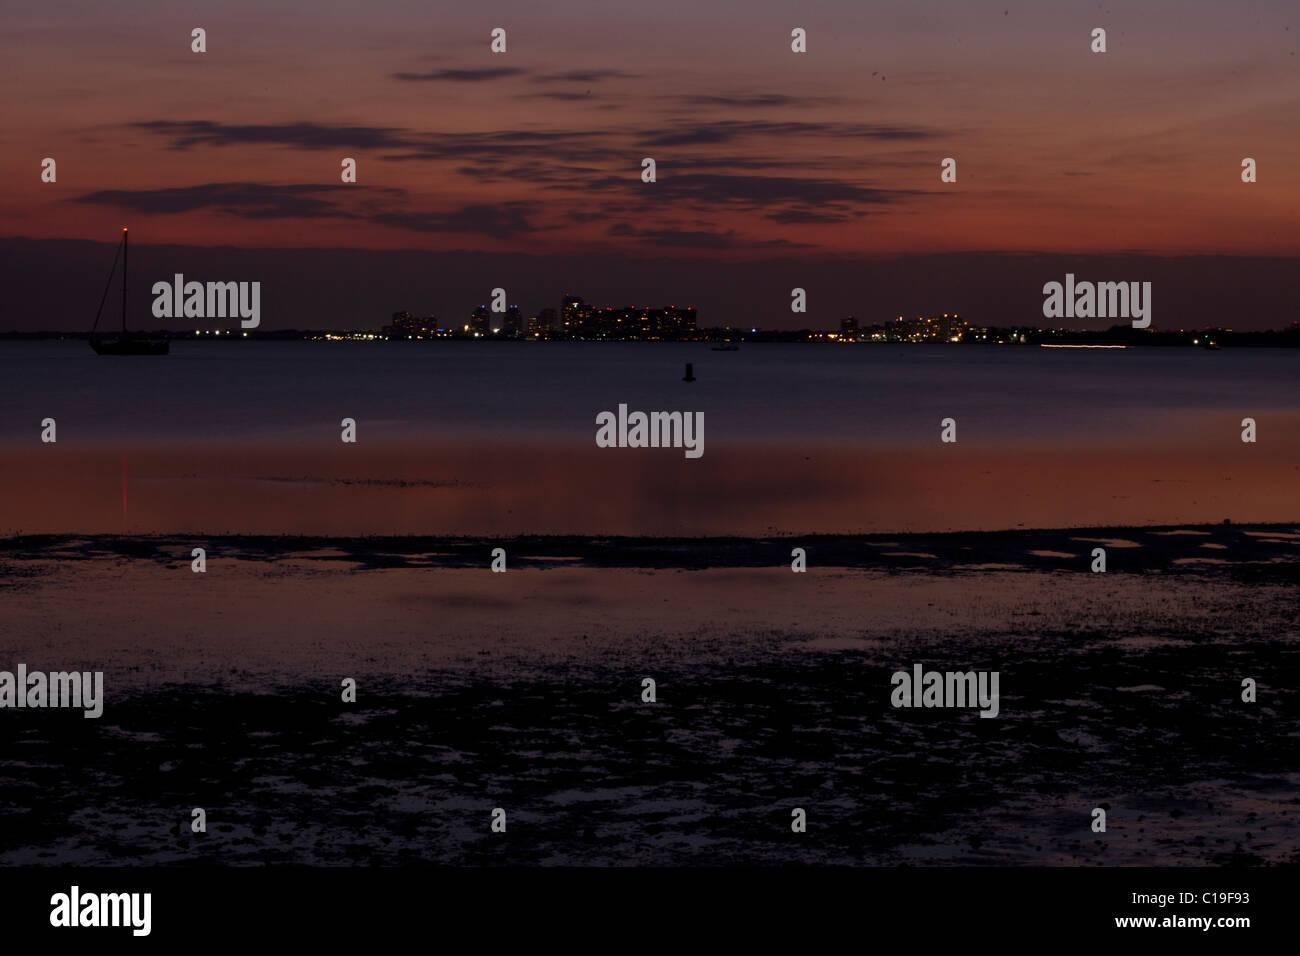 Key Biscayne at twilight, Florida, USA. - Stock Image